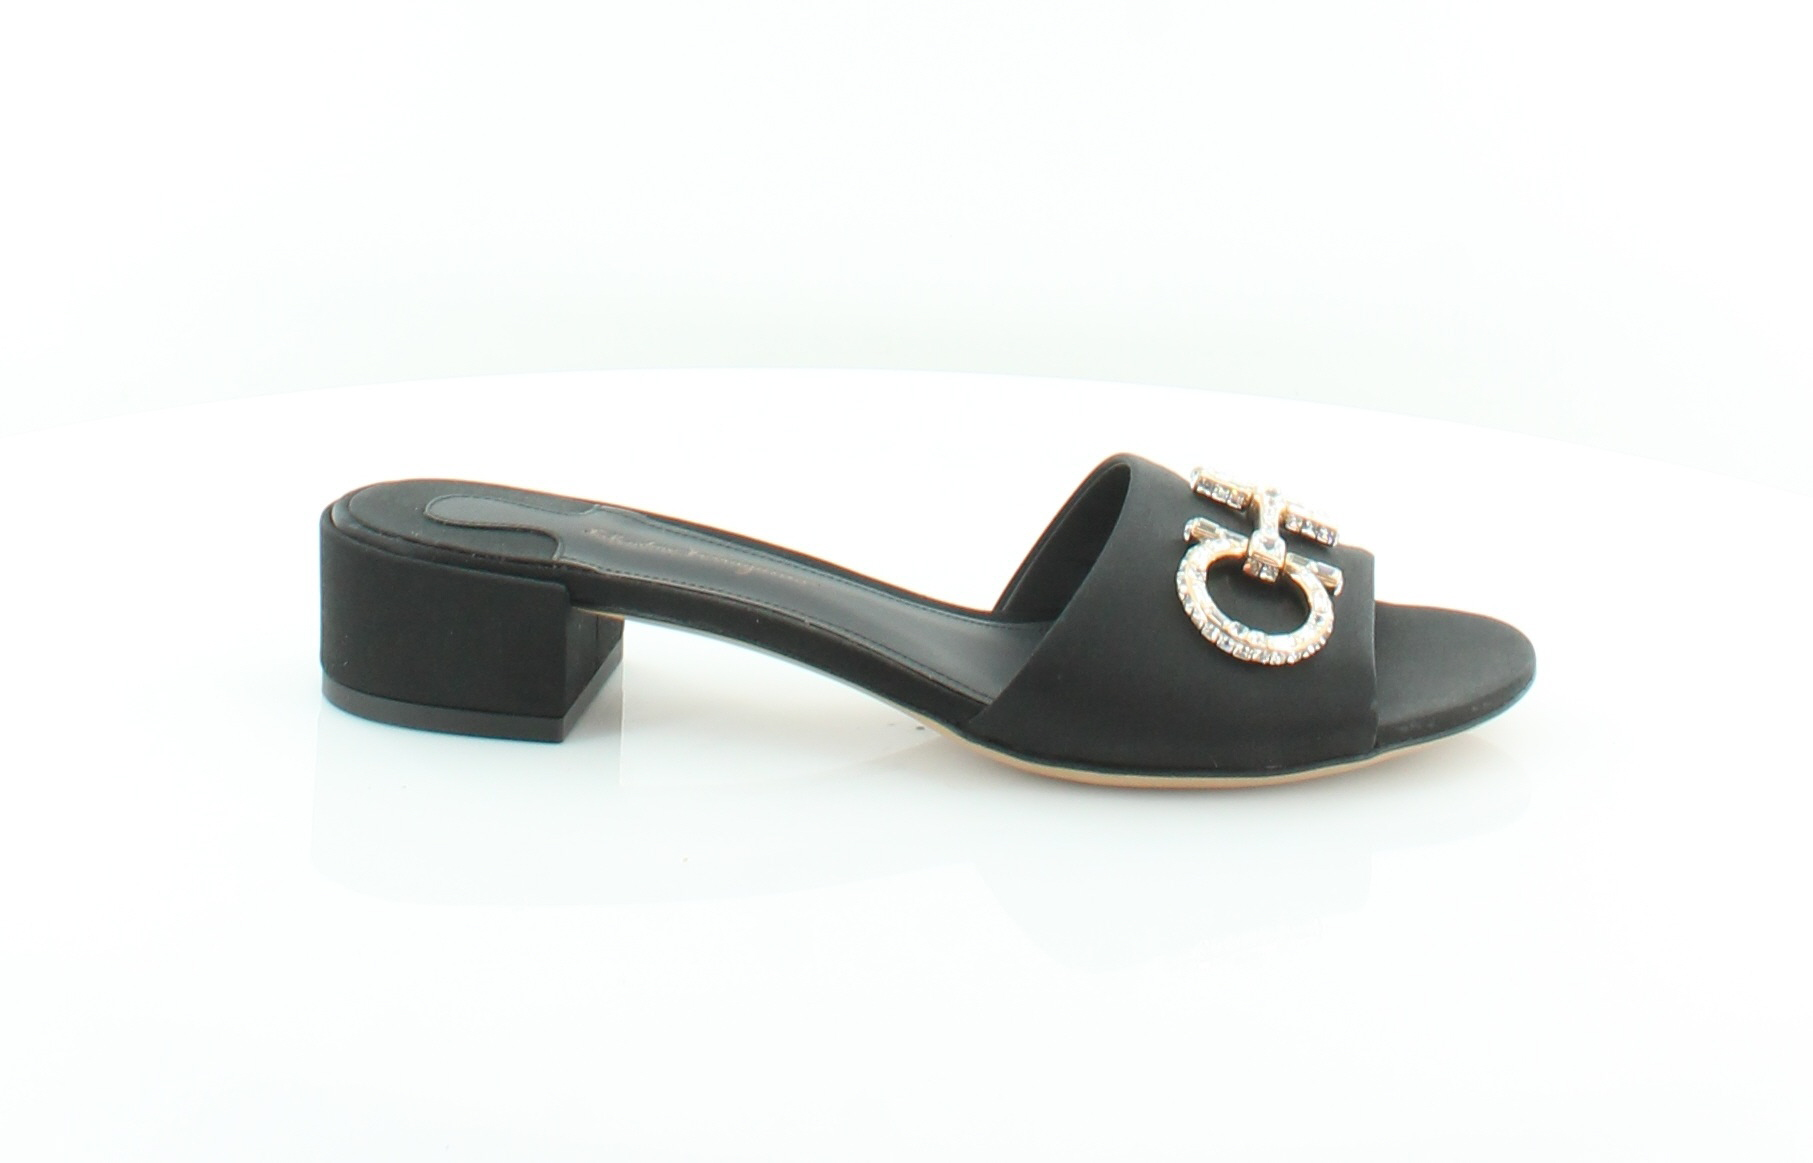 Salvatore Ferragamo New Lampio Black Womens shoes Size 8 M Sandals MSRP  695